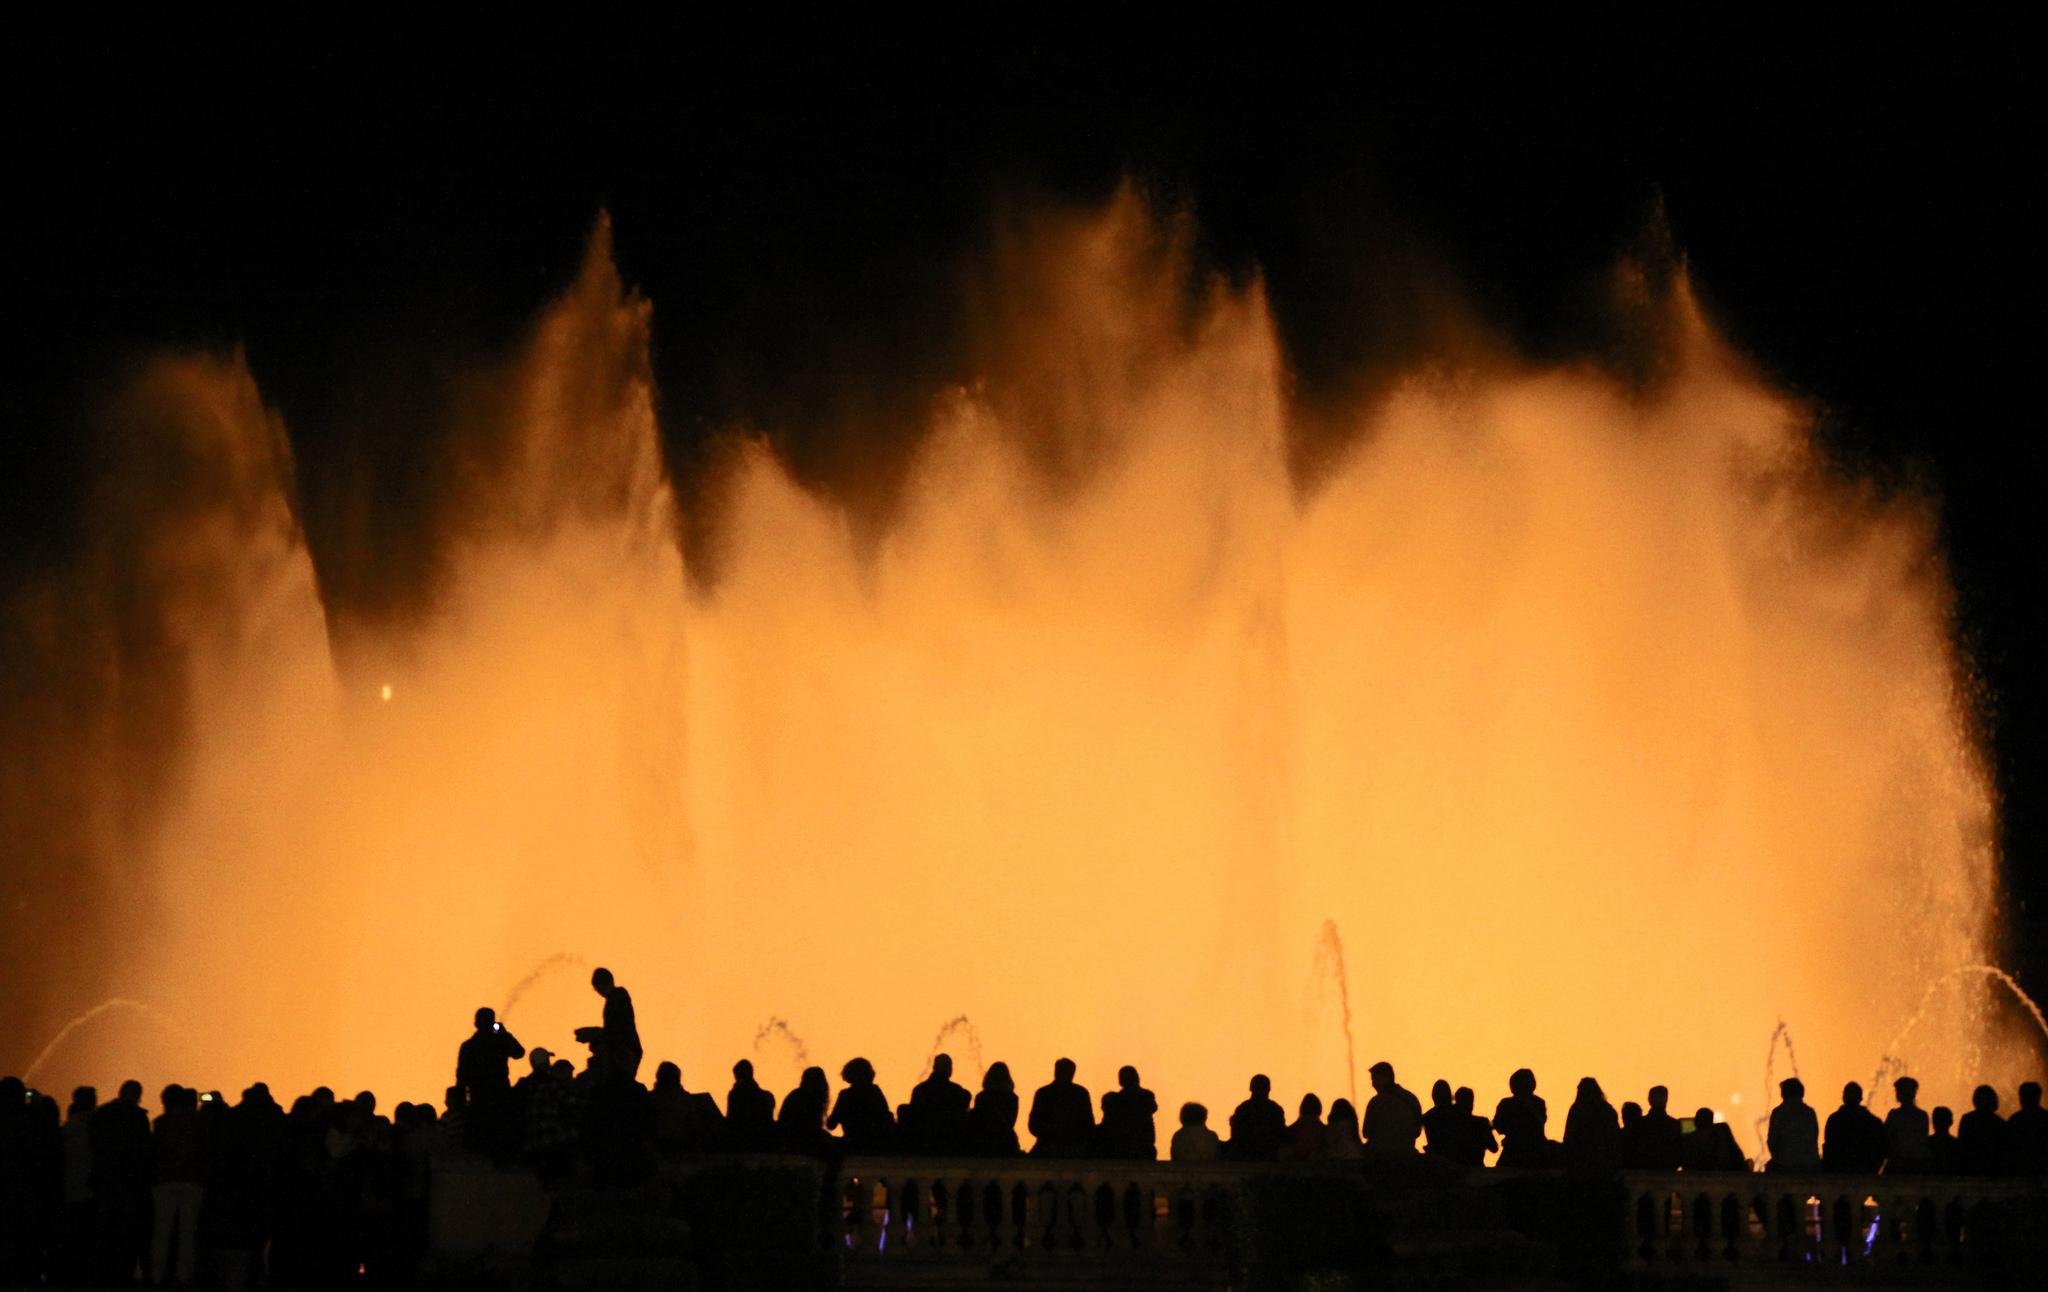 Magic Fountain at Plaça Espanya, Barcelona, Spain